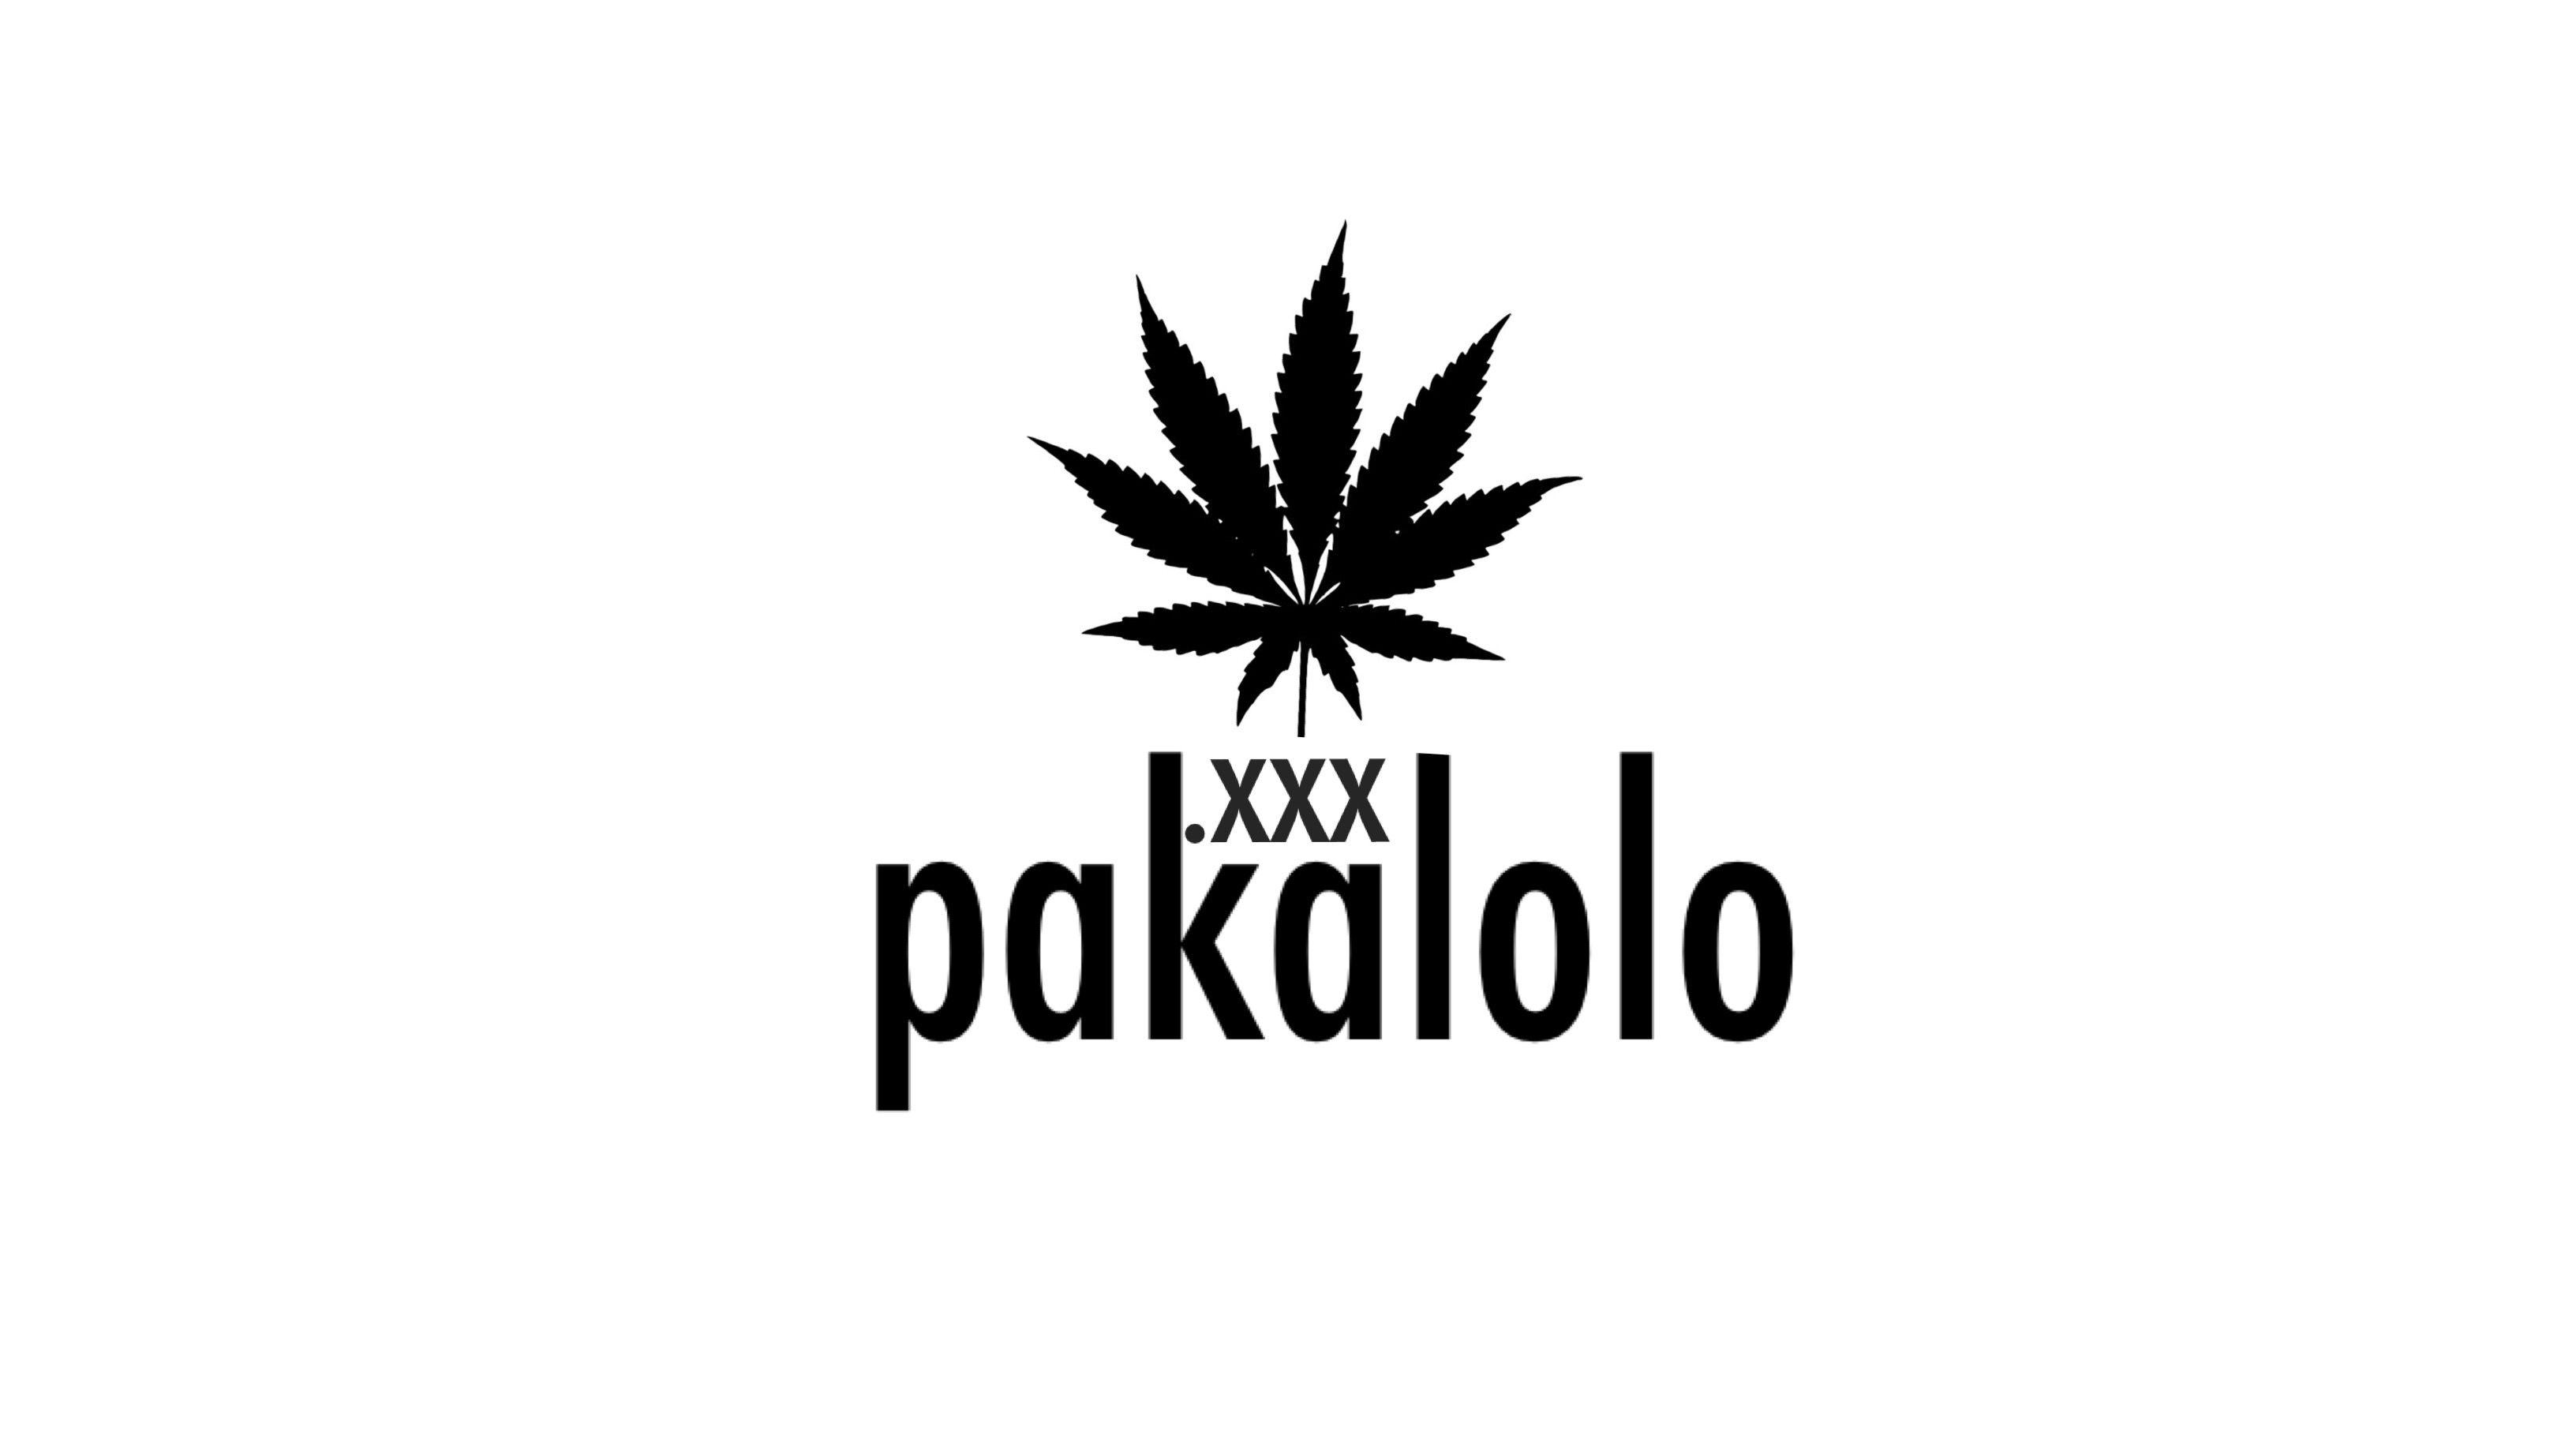 www.pakalolo.xxx  #pakalolo #cannabis #canabis #cannabiz #420 #marijuana #cbd #cbdoil #hawaii #hawaiicannabis  #hawaiimarijuana #pakalolocoffee #cannabiscommunity #cannabisculture #cannabinoids #marijuanamodels #medicalmarijuana #pakalolohawaii #pakalolomafia #cbdcoffee #cannabisheals #cannabiscommunity #cannabisculture #cbdcures #cbdmovement #cbdlife #cannibinoids #cbdlifestyle #coffeeaddict #coffeeshop #gellato33 #pakaloloxxx